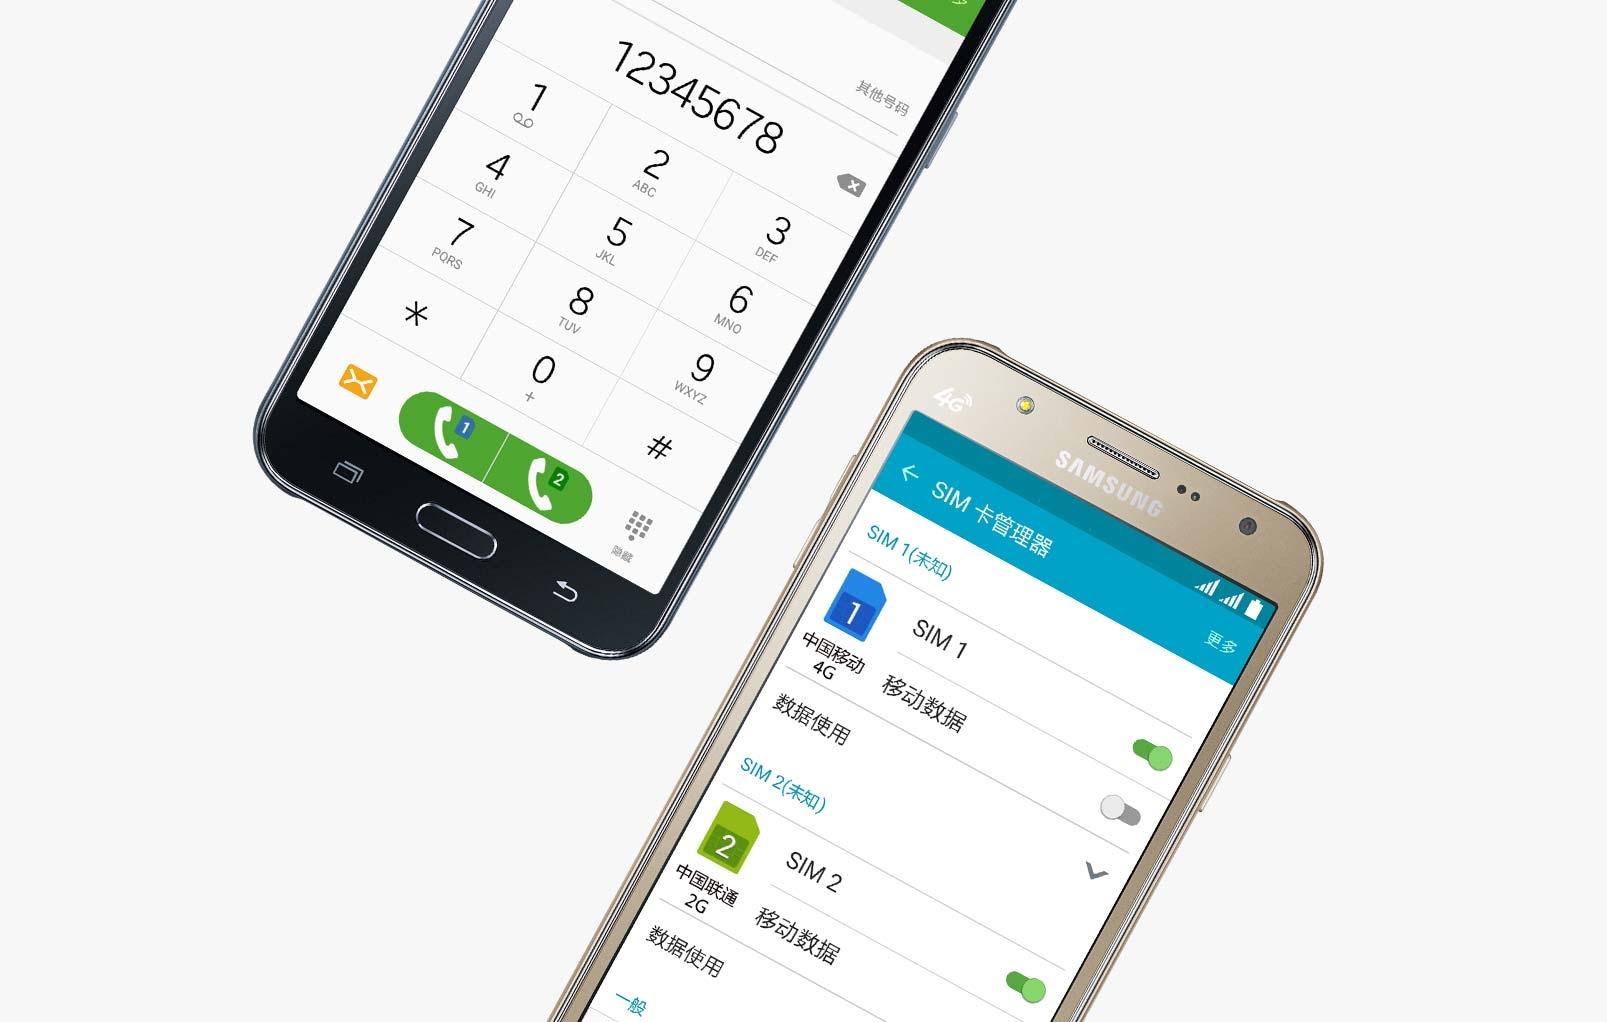 مشخصات مدل Galaxy J7 2016 توسط GFXBench